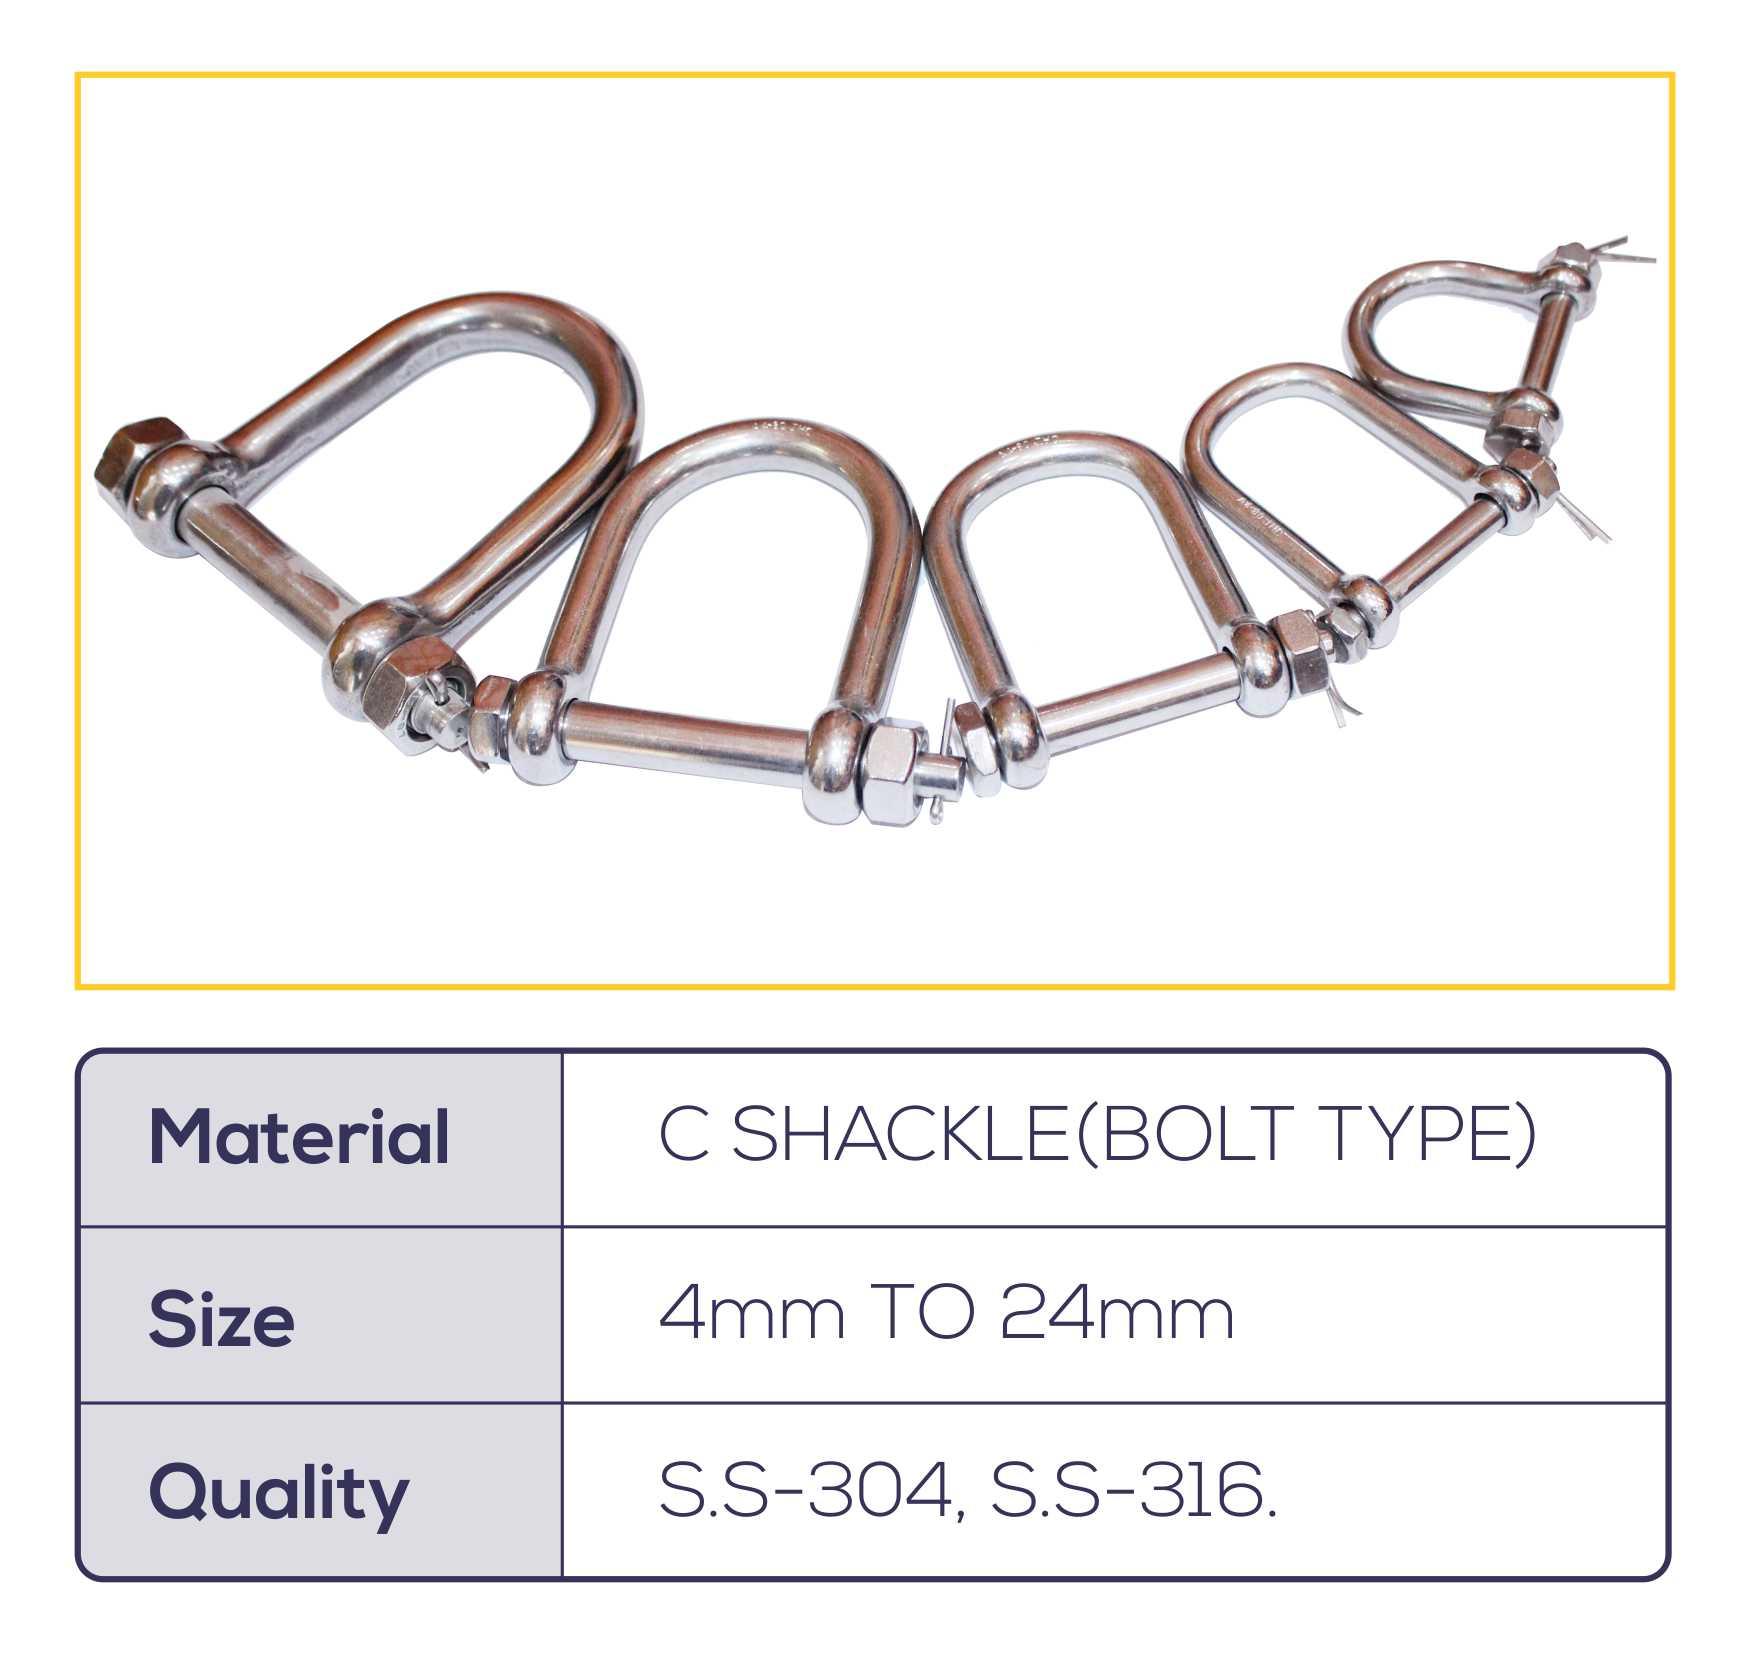 C-Shackle(Bolt Type)